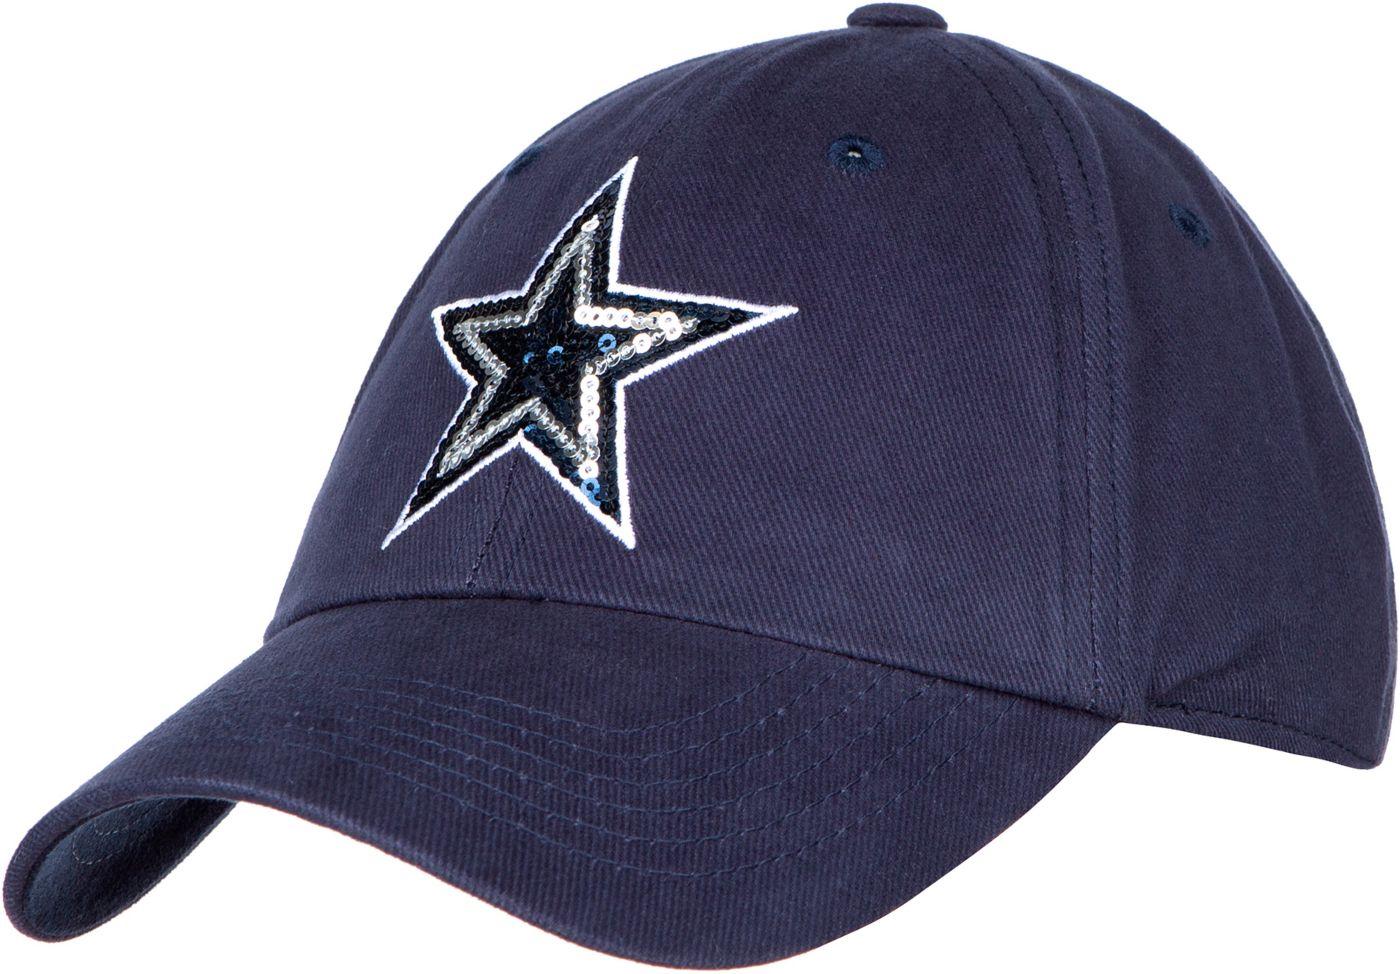 Dallas Cowboys Merchandising Women's Shimmer Navy Adjustable Hat